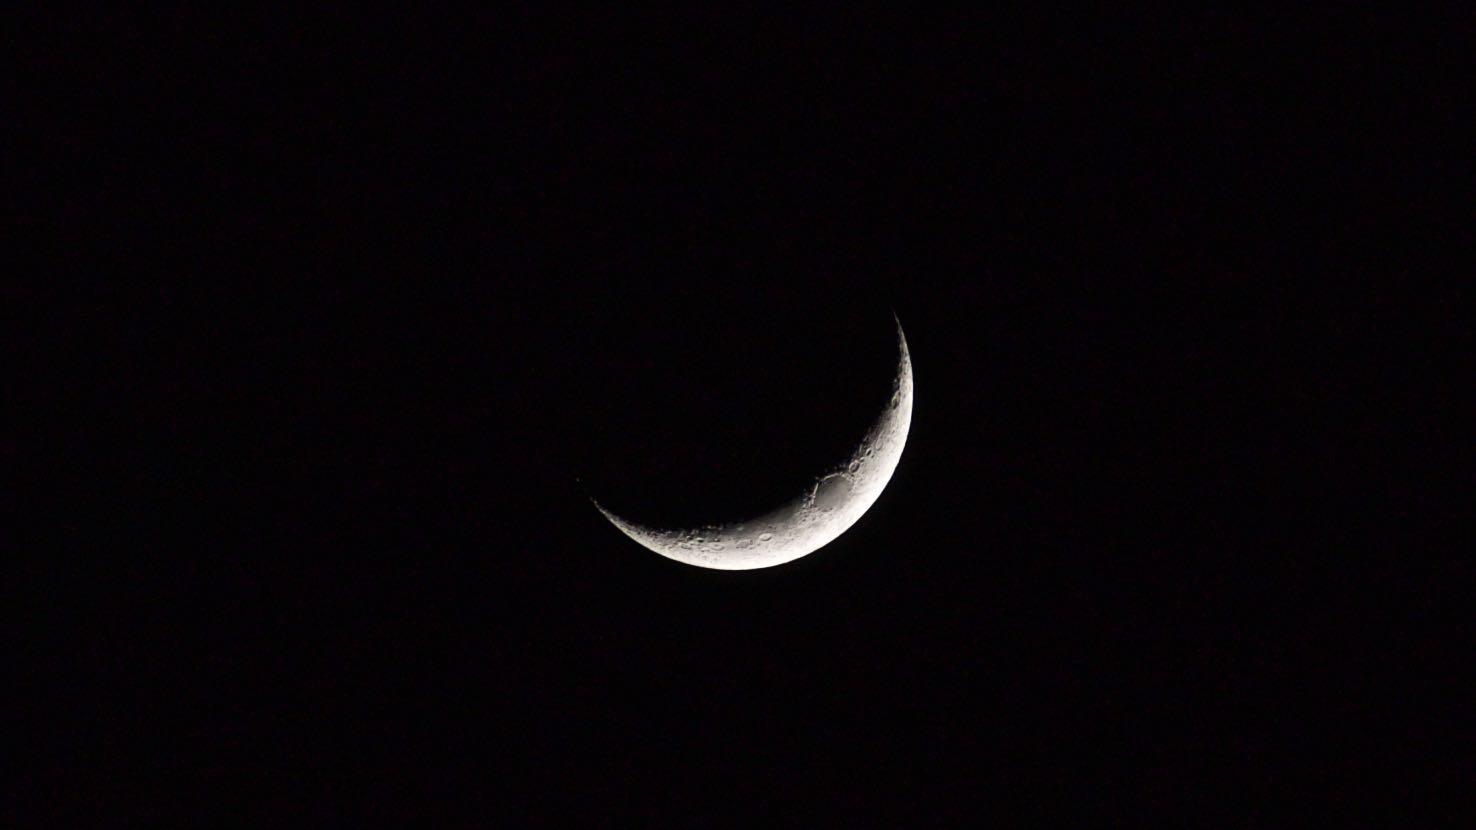 Crescent moon, night, evening, monday, dark, sun, moon, star, texture, astrophotography, march